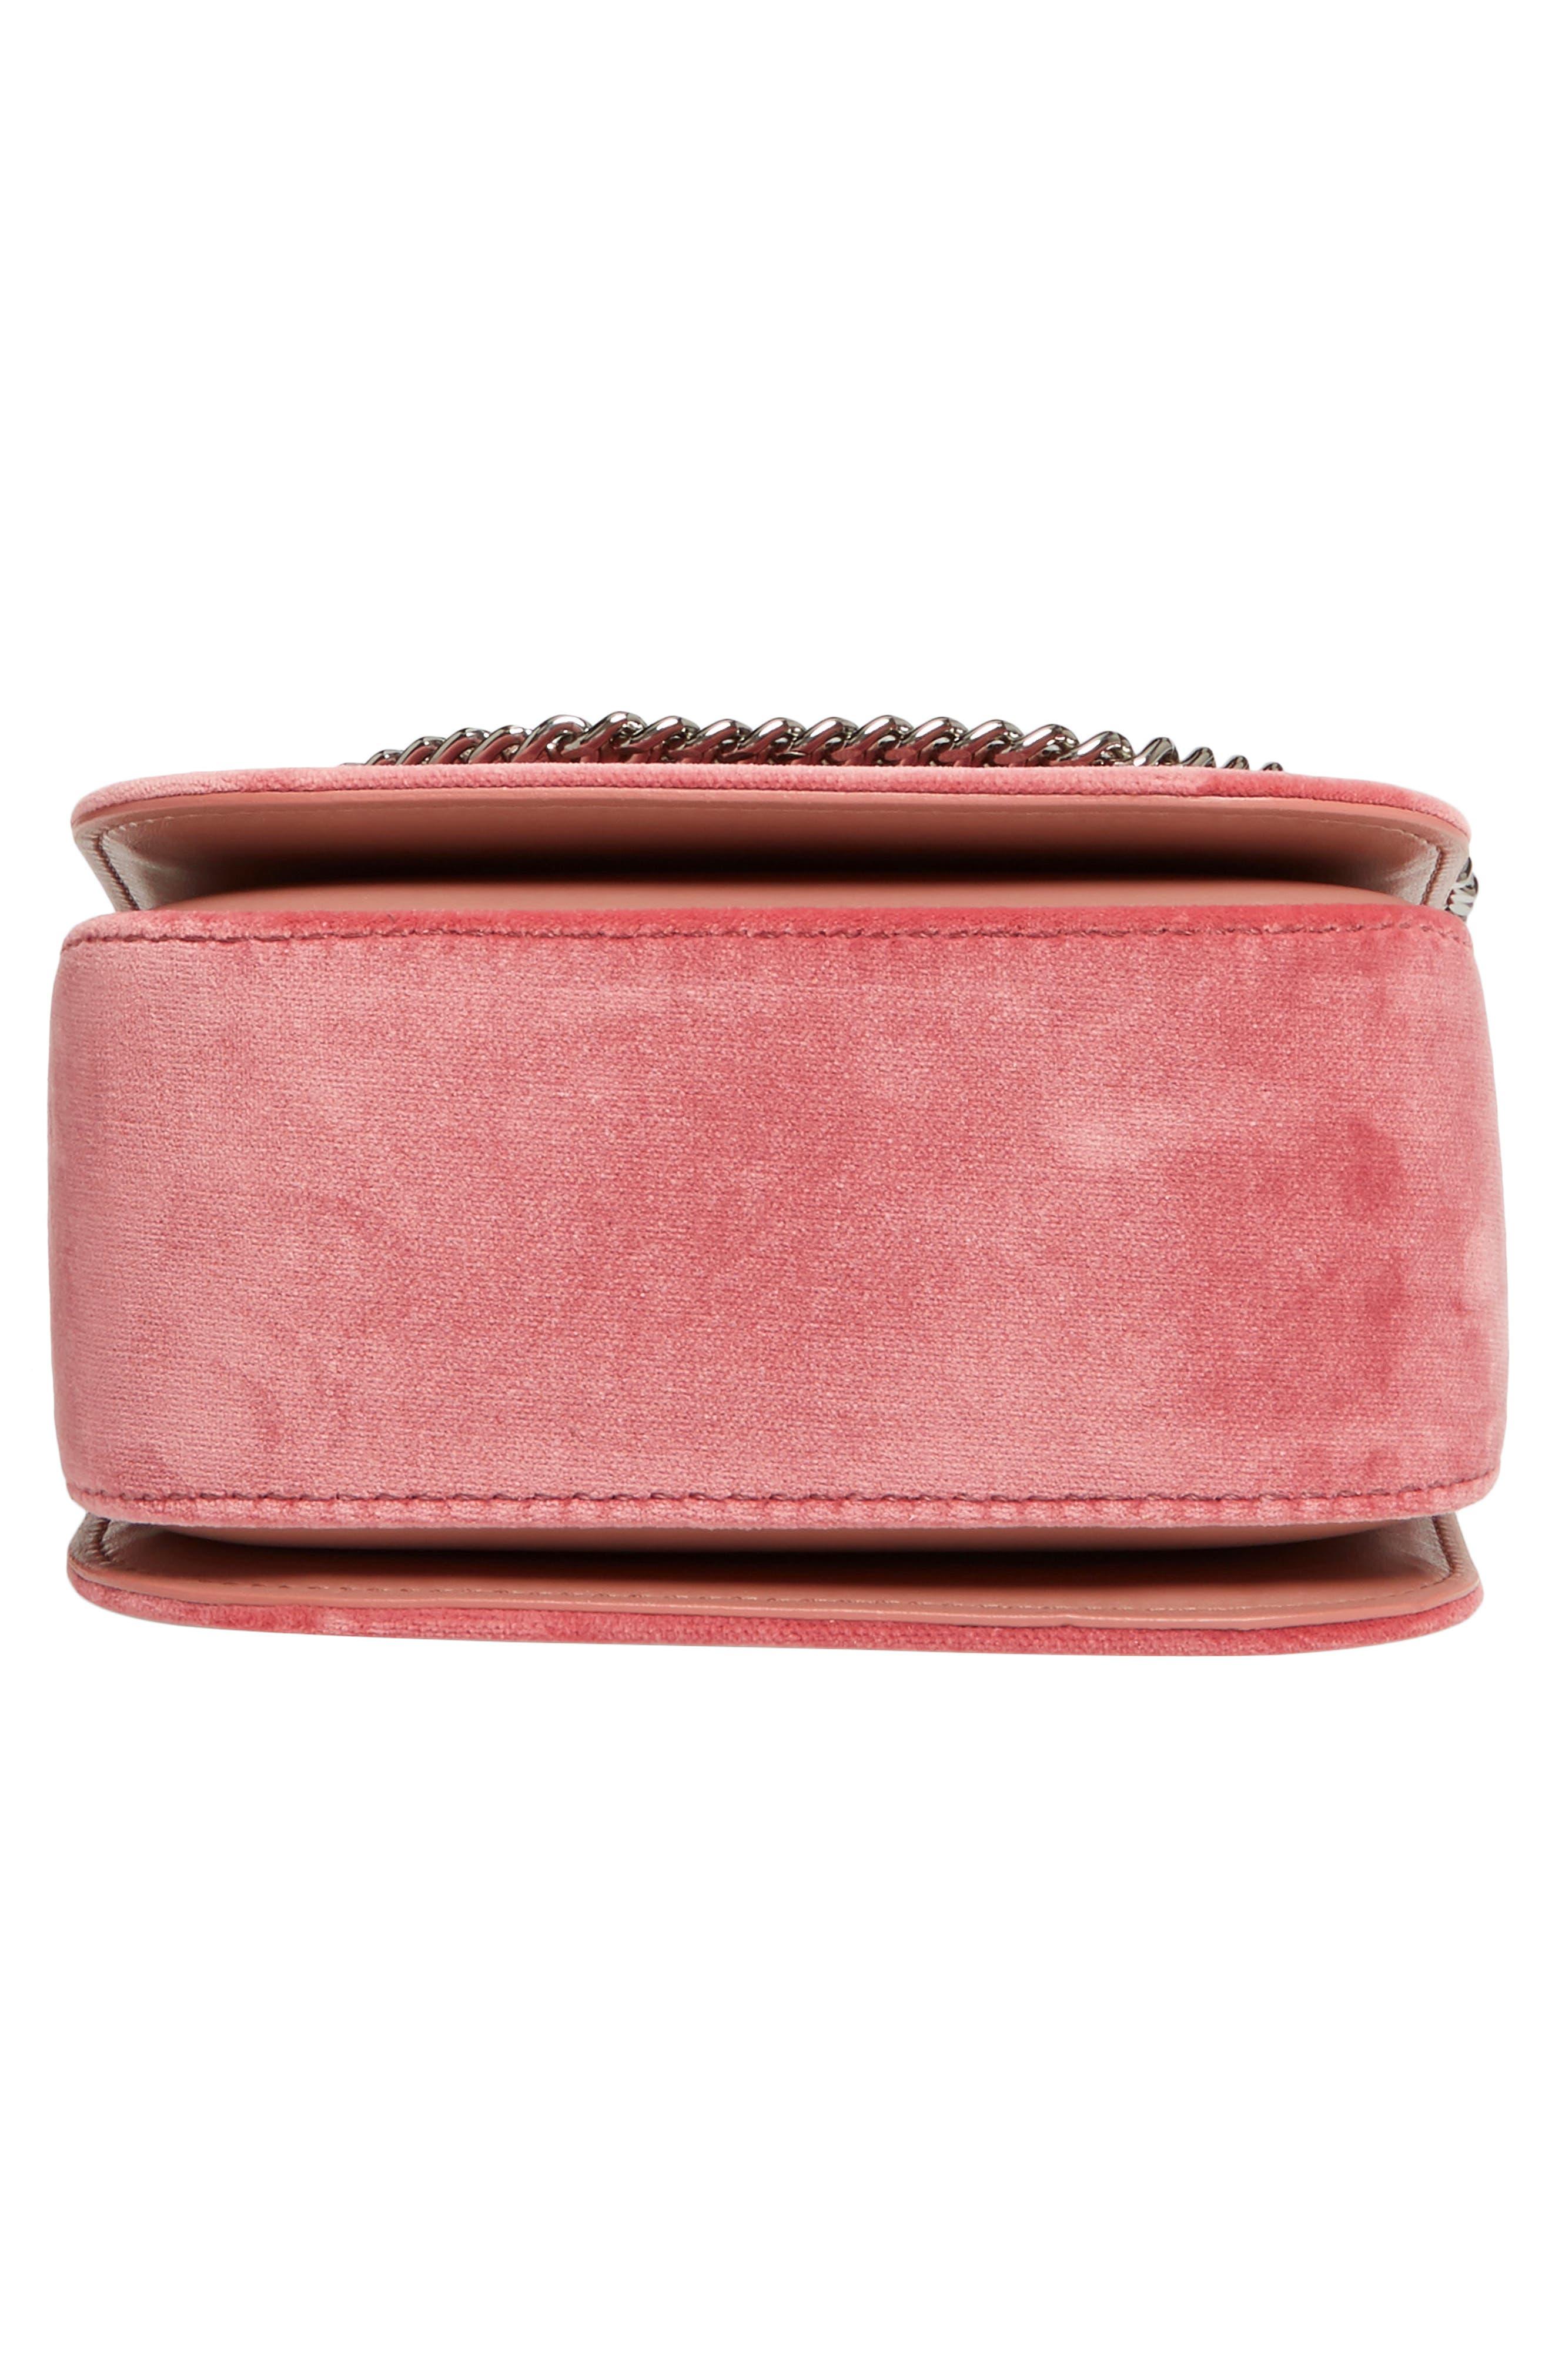 Mini Falabella Box Velvet Shoulder Bag,                             Alternate thumbnail 6, color,                             640